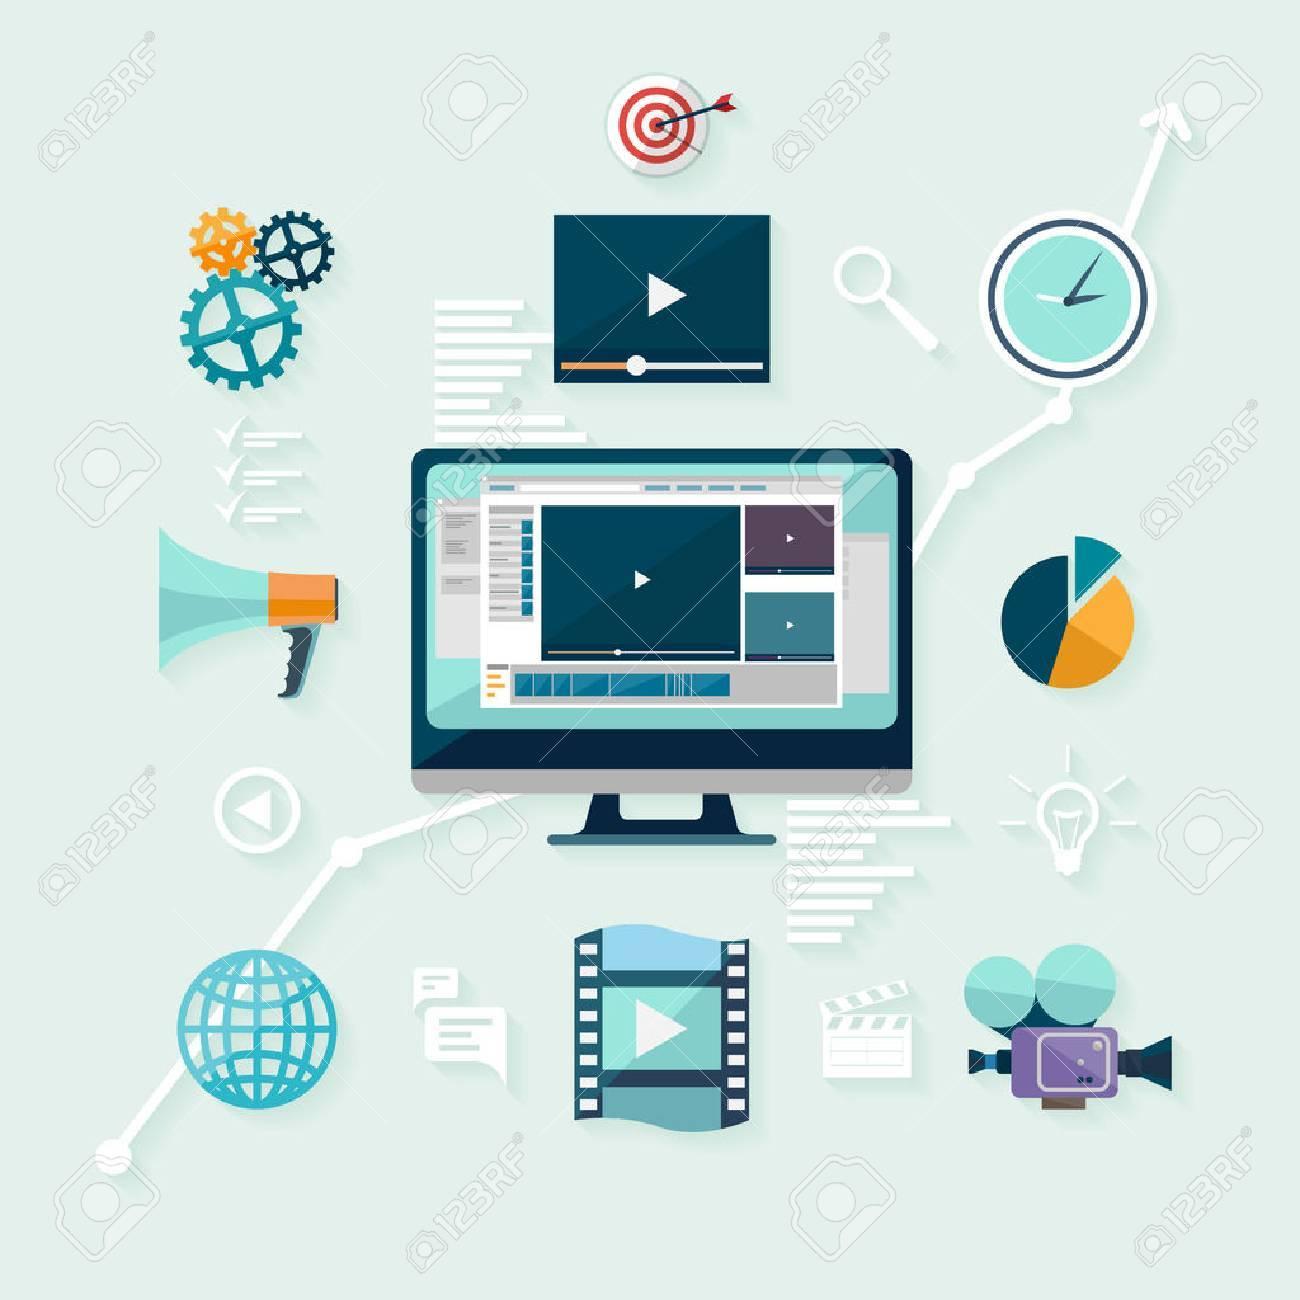 Digital marketing. Flat design. - 47833058